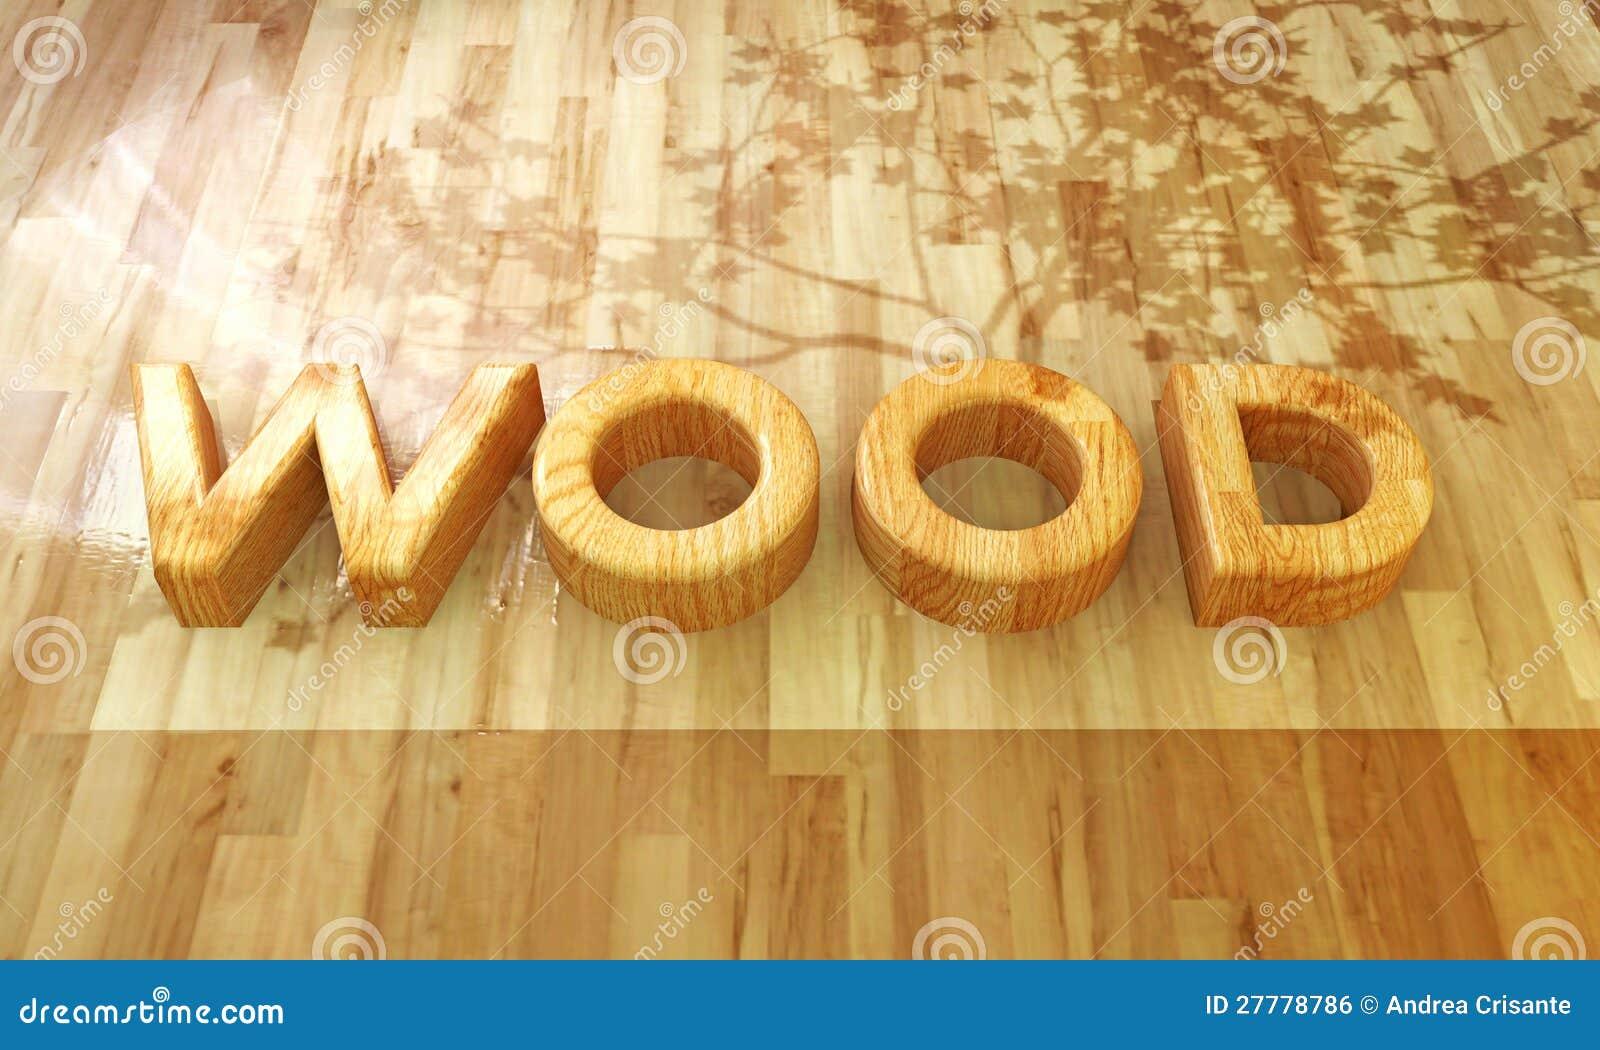 wood font royalty free stock image image 27778786